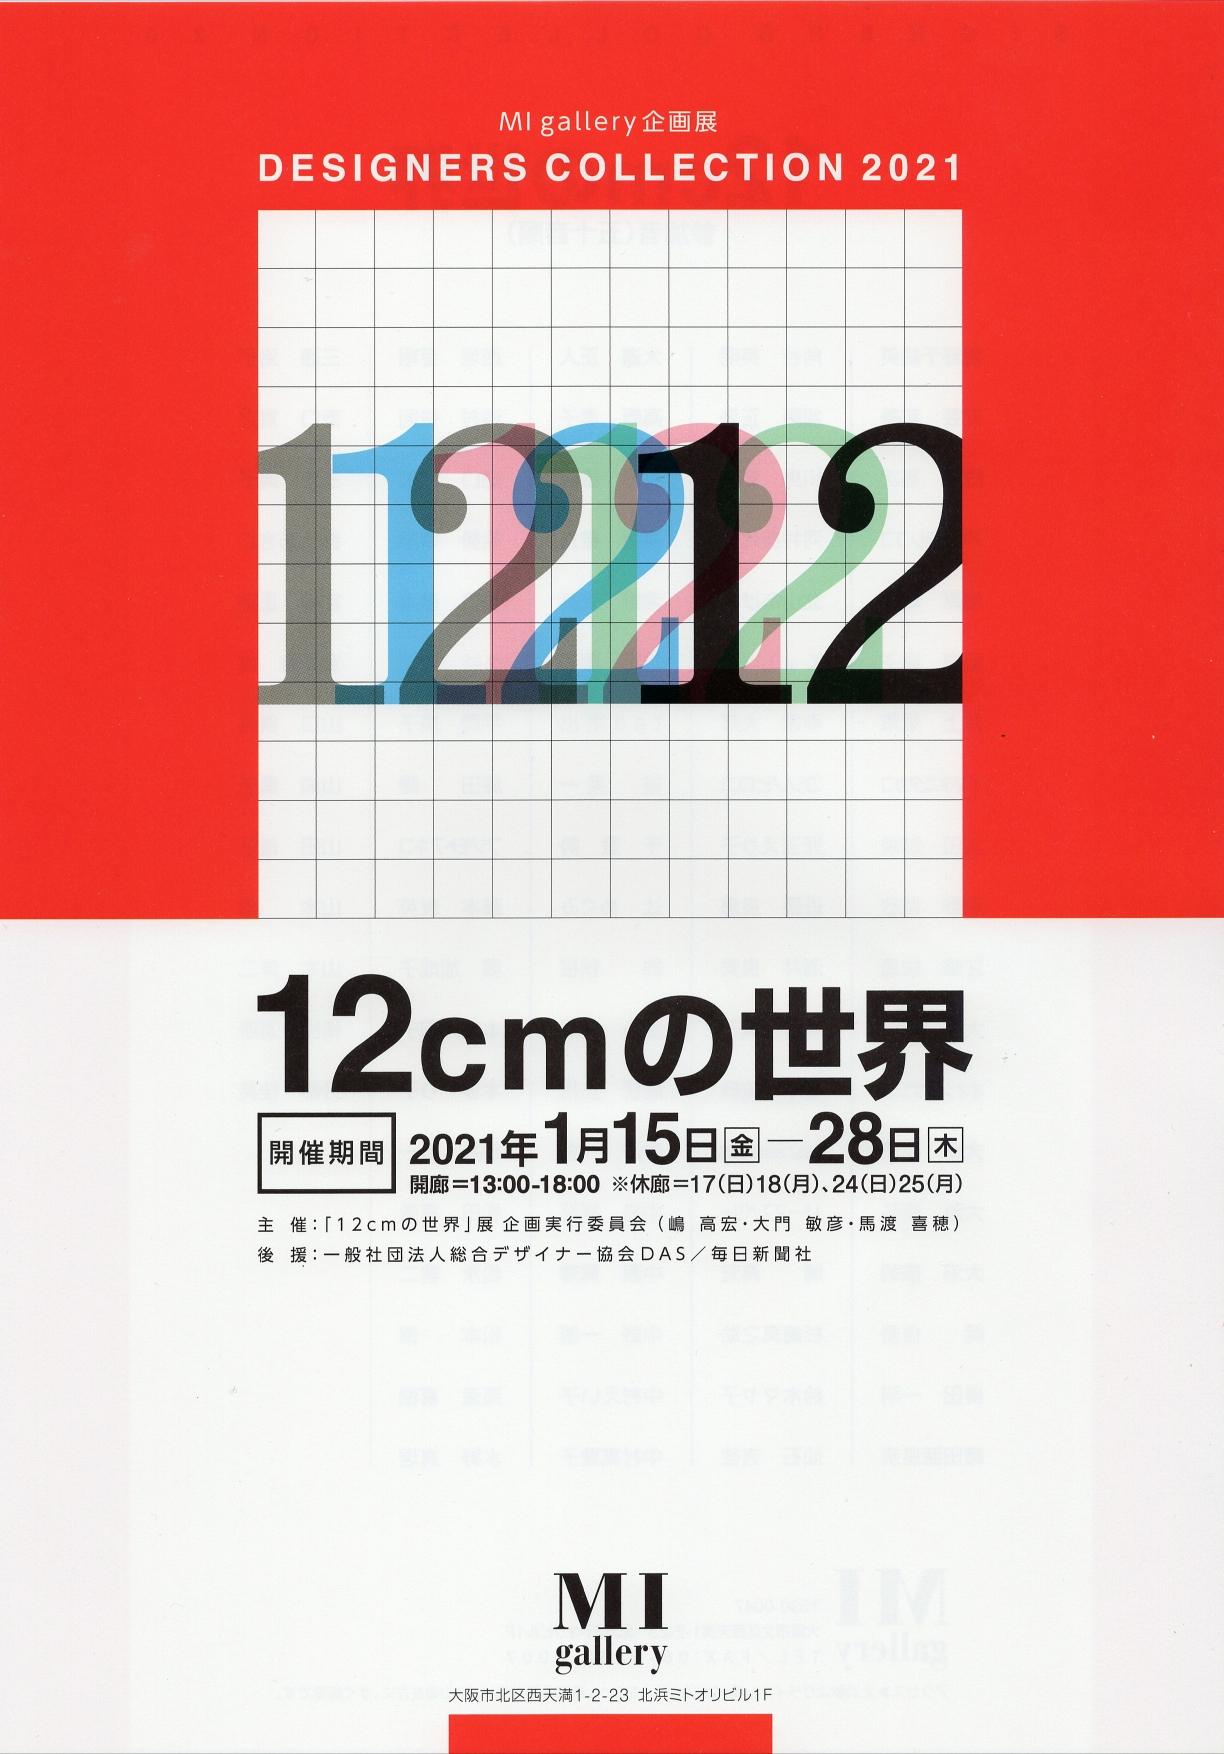 Exhibition 1. 15- 28「12cmの世界」展参加 (日•月曜休廊)*会場: MI garelly 終了しました